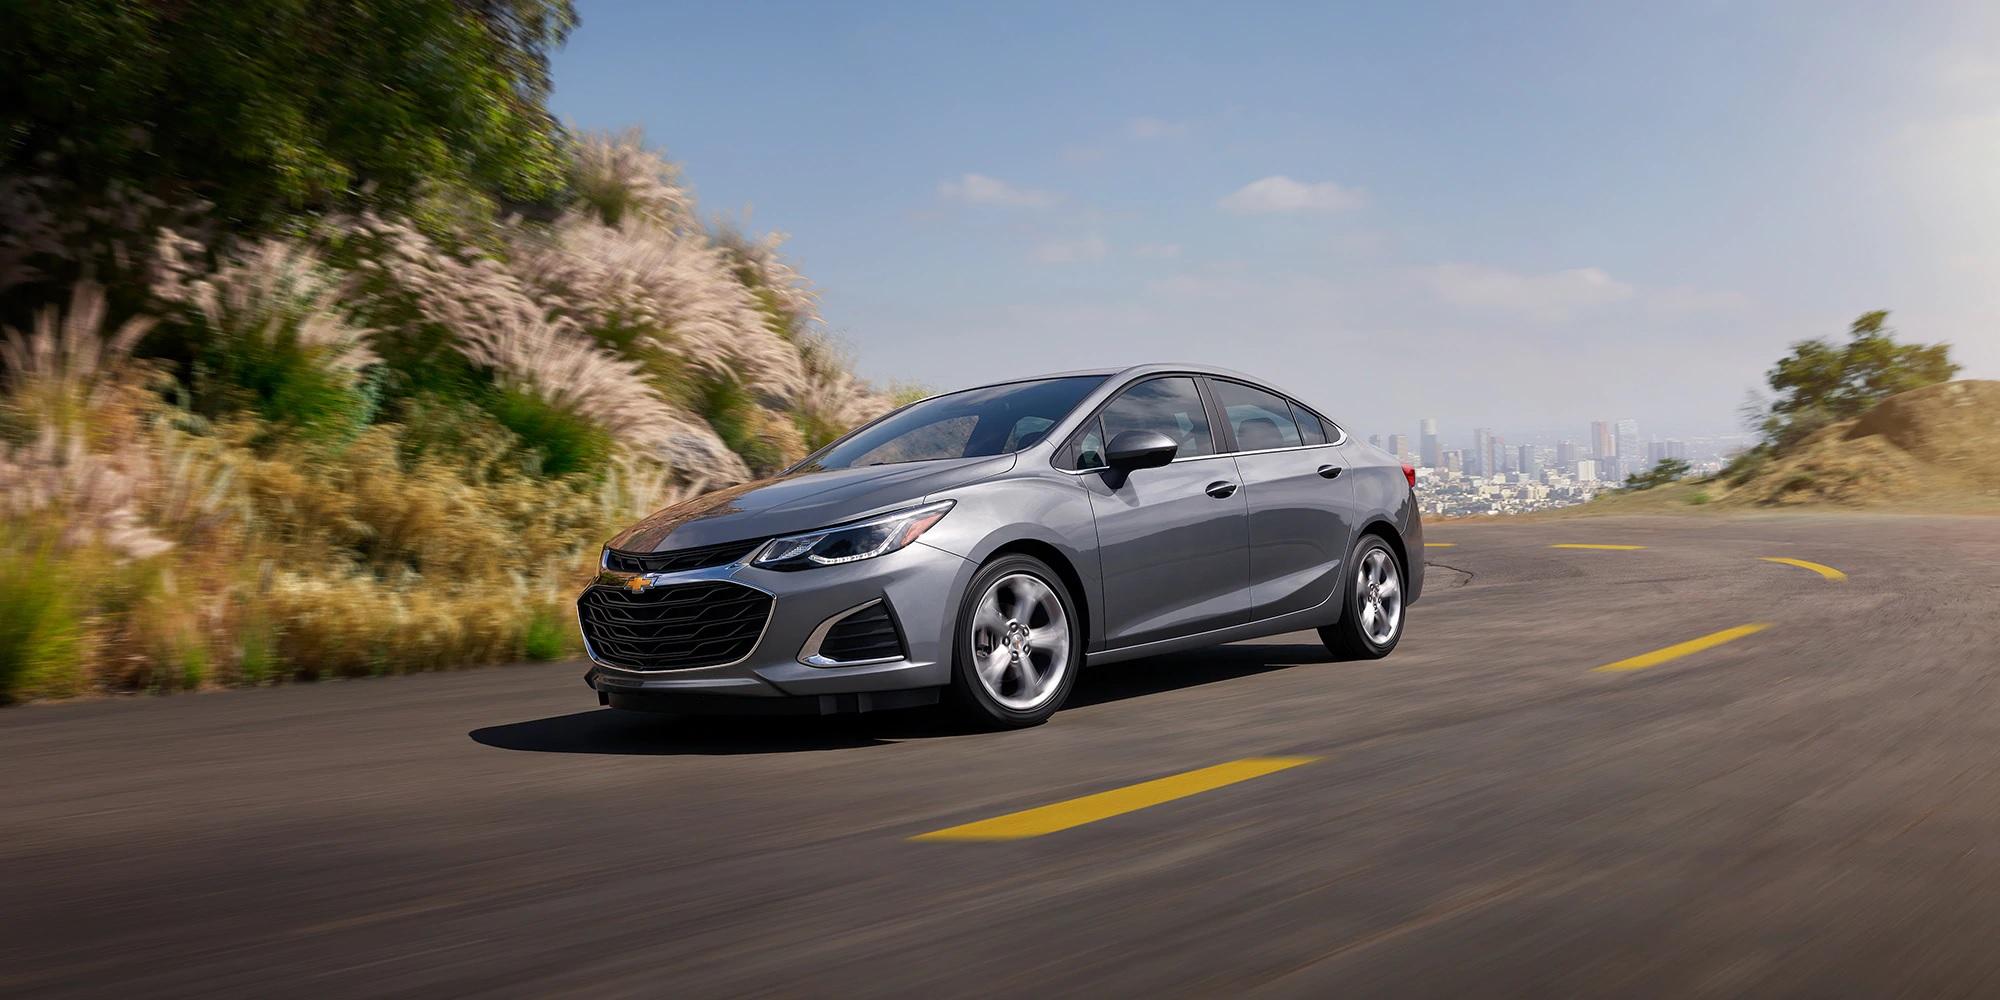 2019 Chevrolet Cruze for Sale near Tulsa, OK - James Hodge